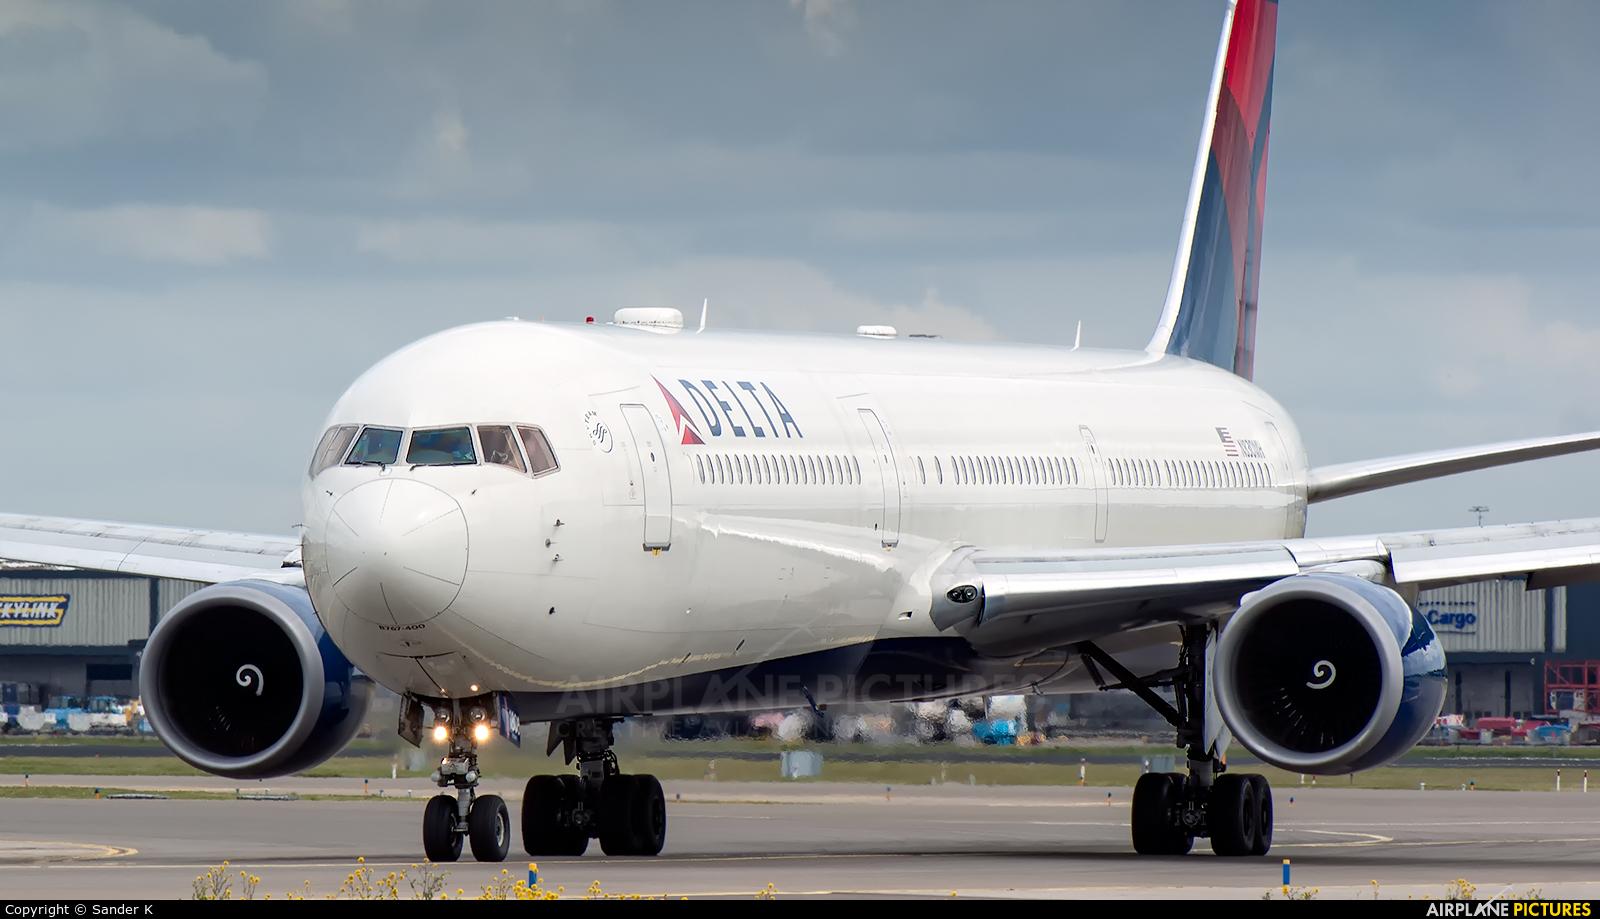 Delta Air Lines N830MH aircraft at Amsterdam - Schiphol